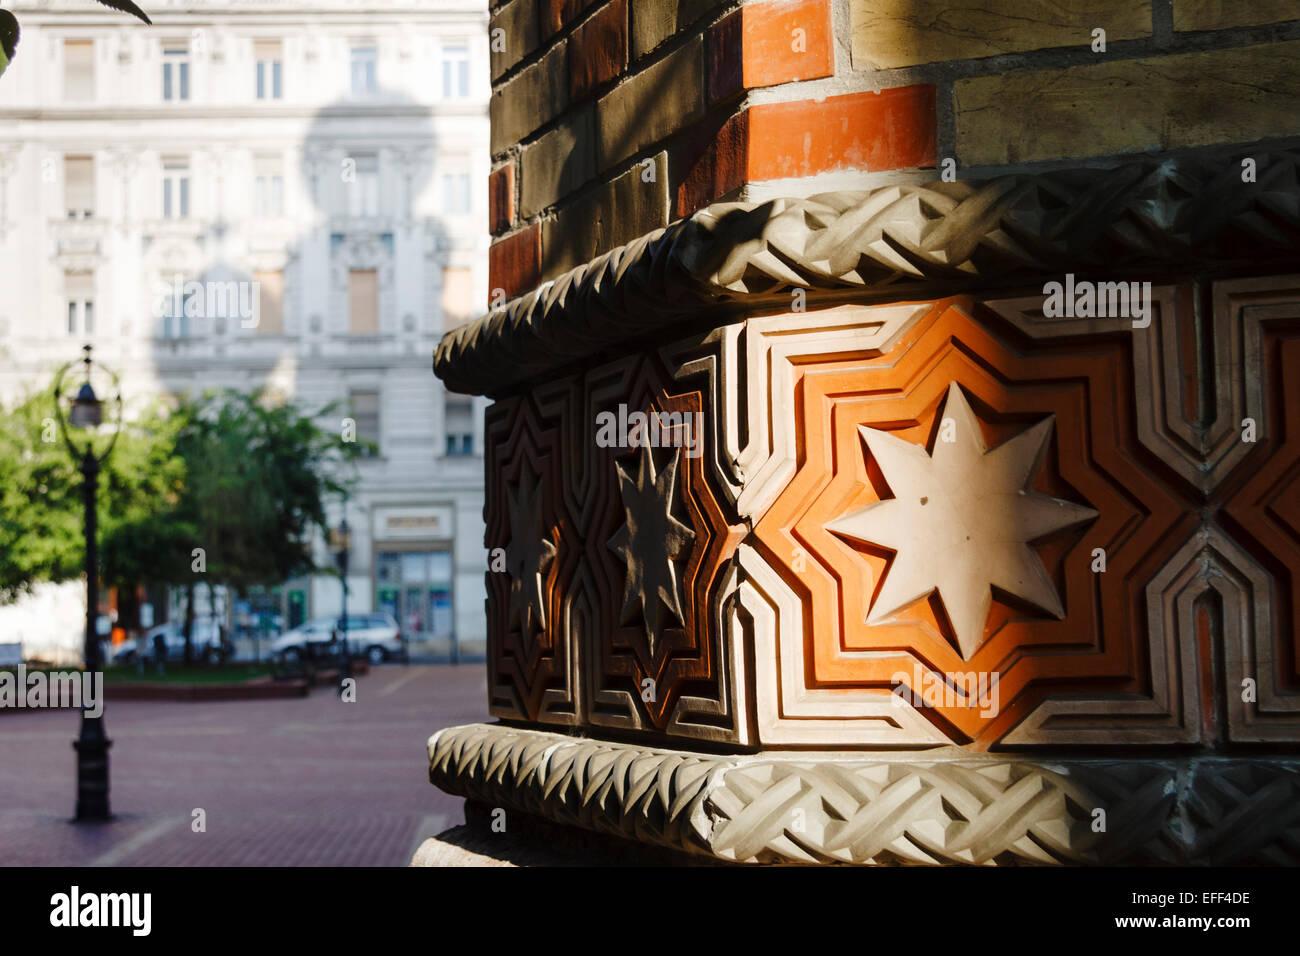 Great Synagogue, Dohány street, Budapest, Hungary - Stock Image